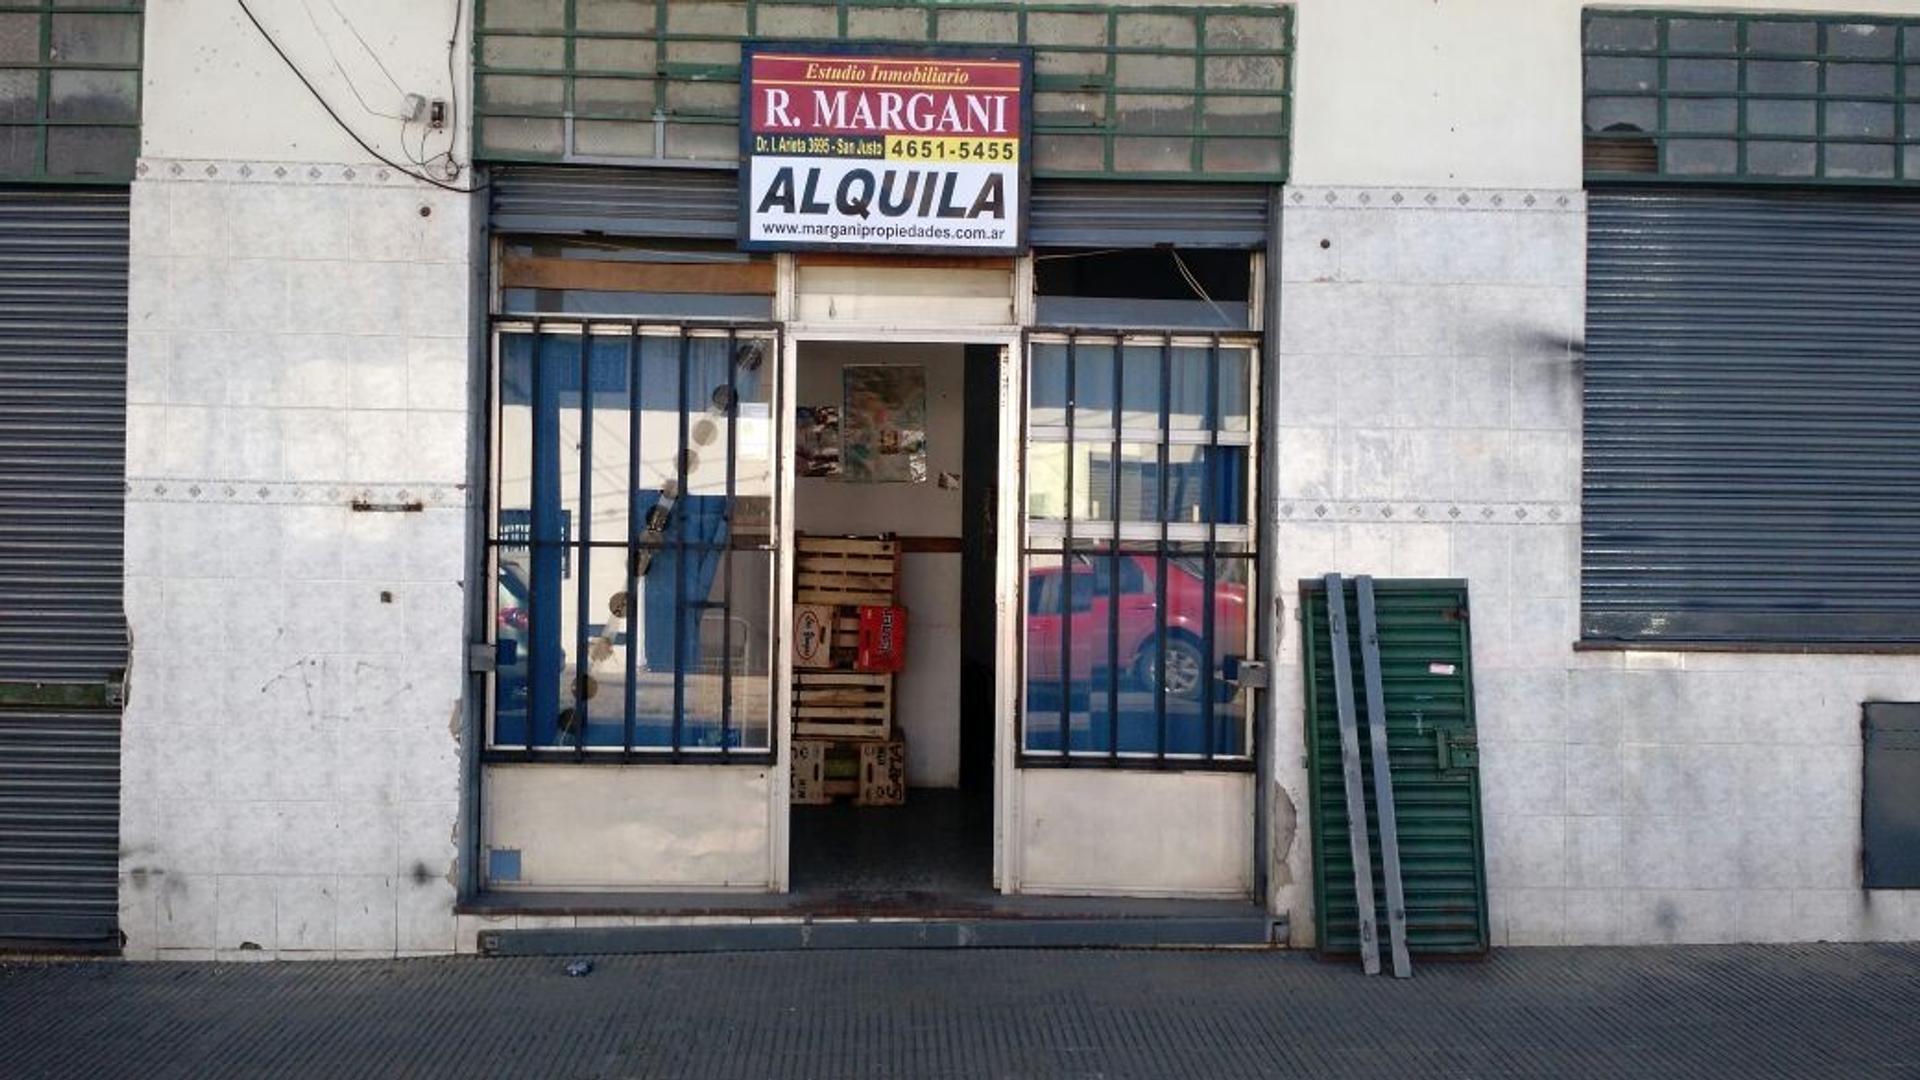 Local Comercial 20m2 + Cuarto de Baño (mts de Dr. I. Arieta)